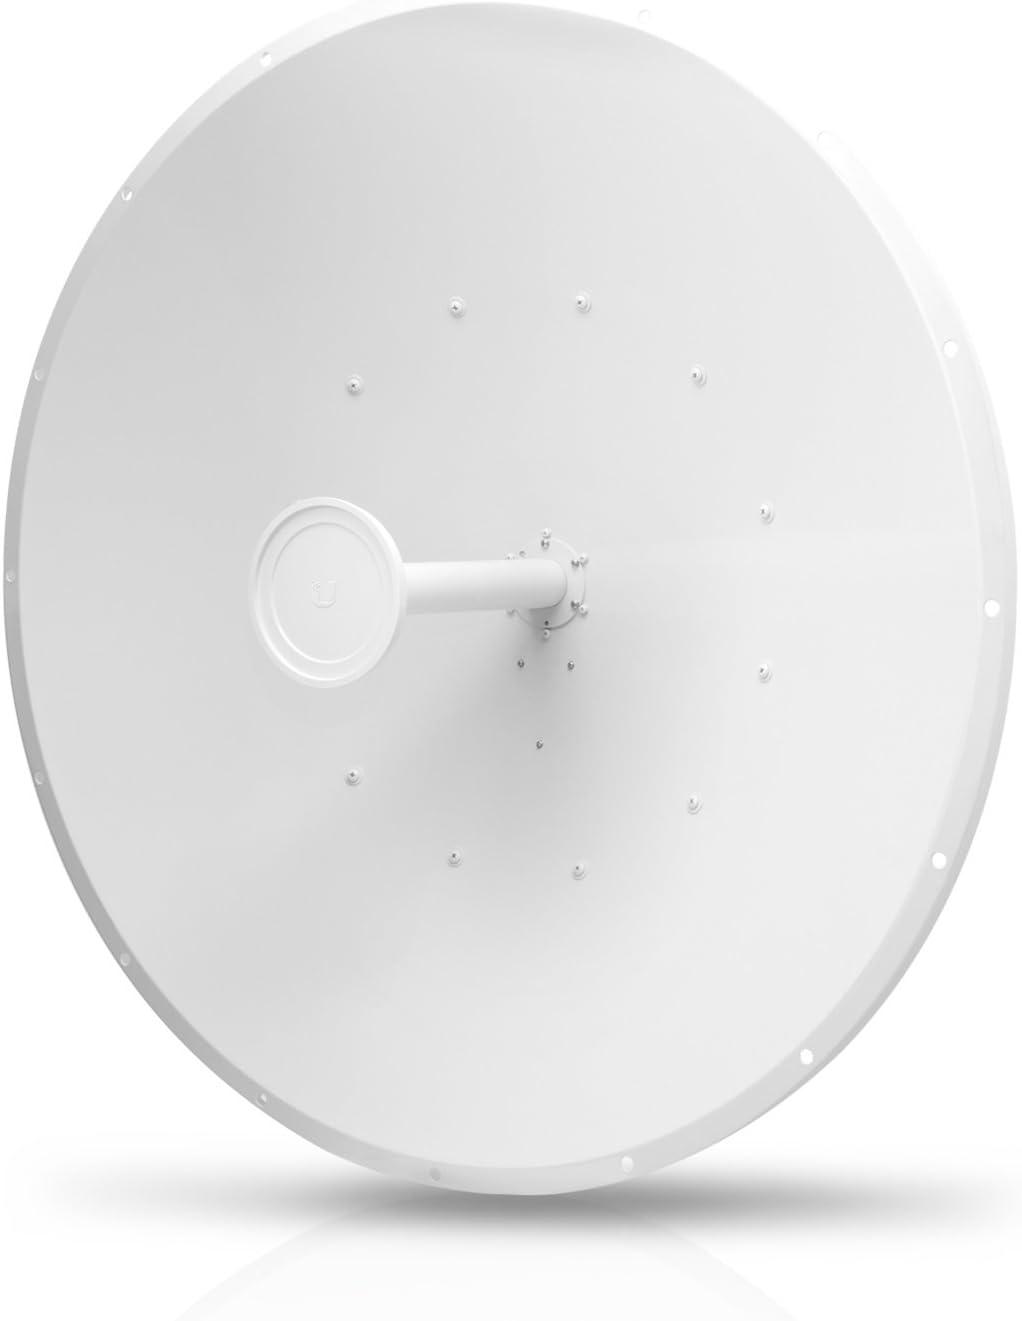 Ubiquiti Networks af-5g34-s45 - Antena (34 dbi, 5.1-5.8 GHz, 3°, 3°, polarización Dual, 1.4:1).